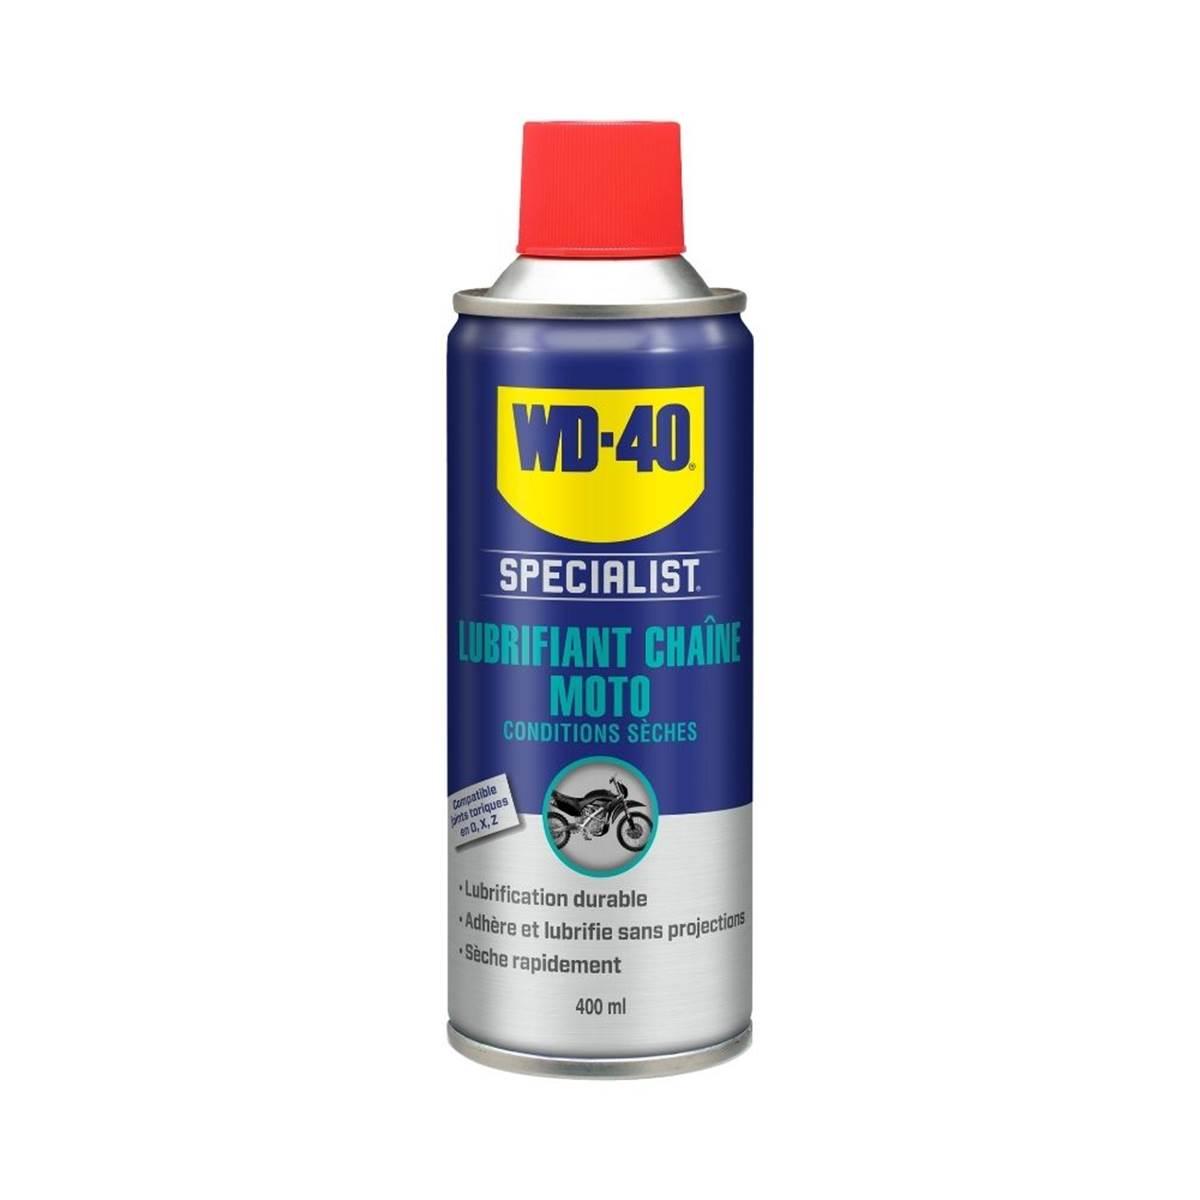 Lubrifiant Chaîne Conditions Sèches WD-40 Specialist Moto 400 ml